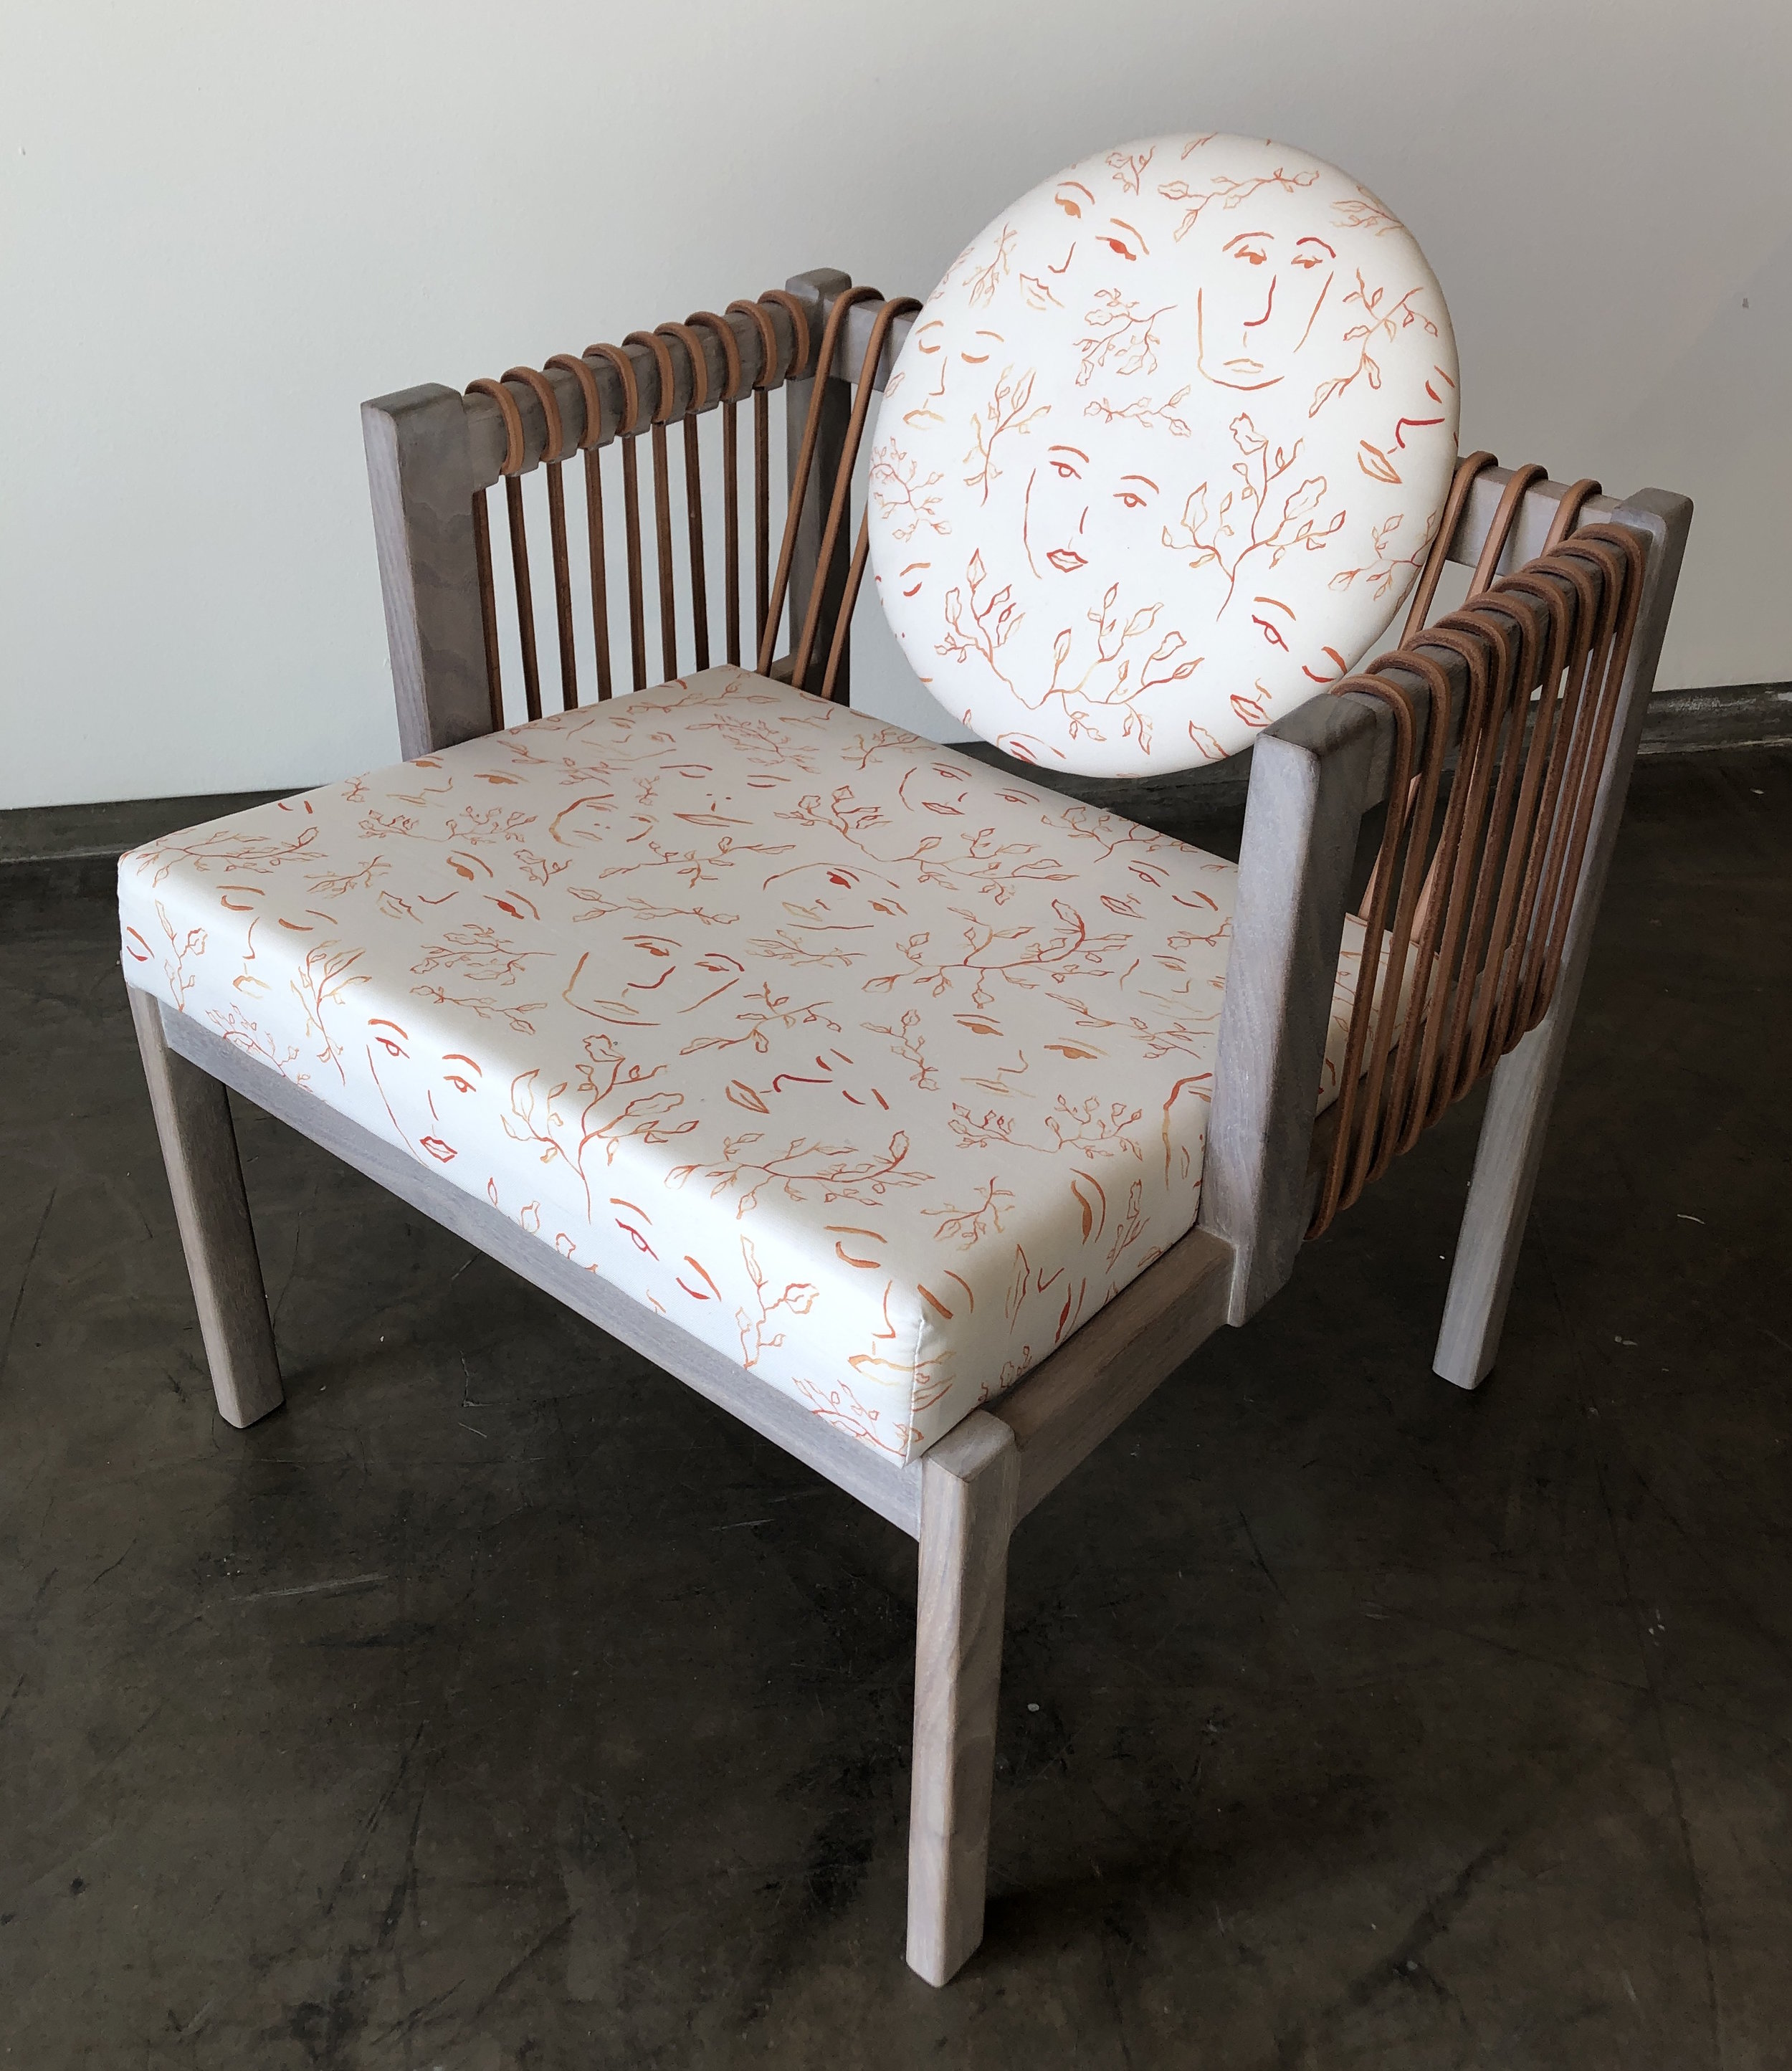 Orange Satyr Fabric - Thomas Hayes Studio Chair.JPG